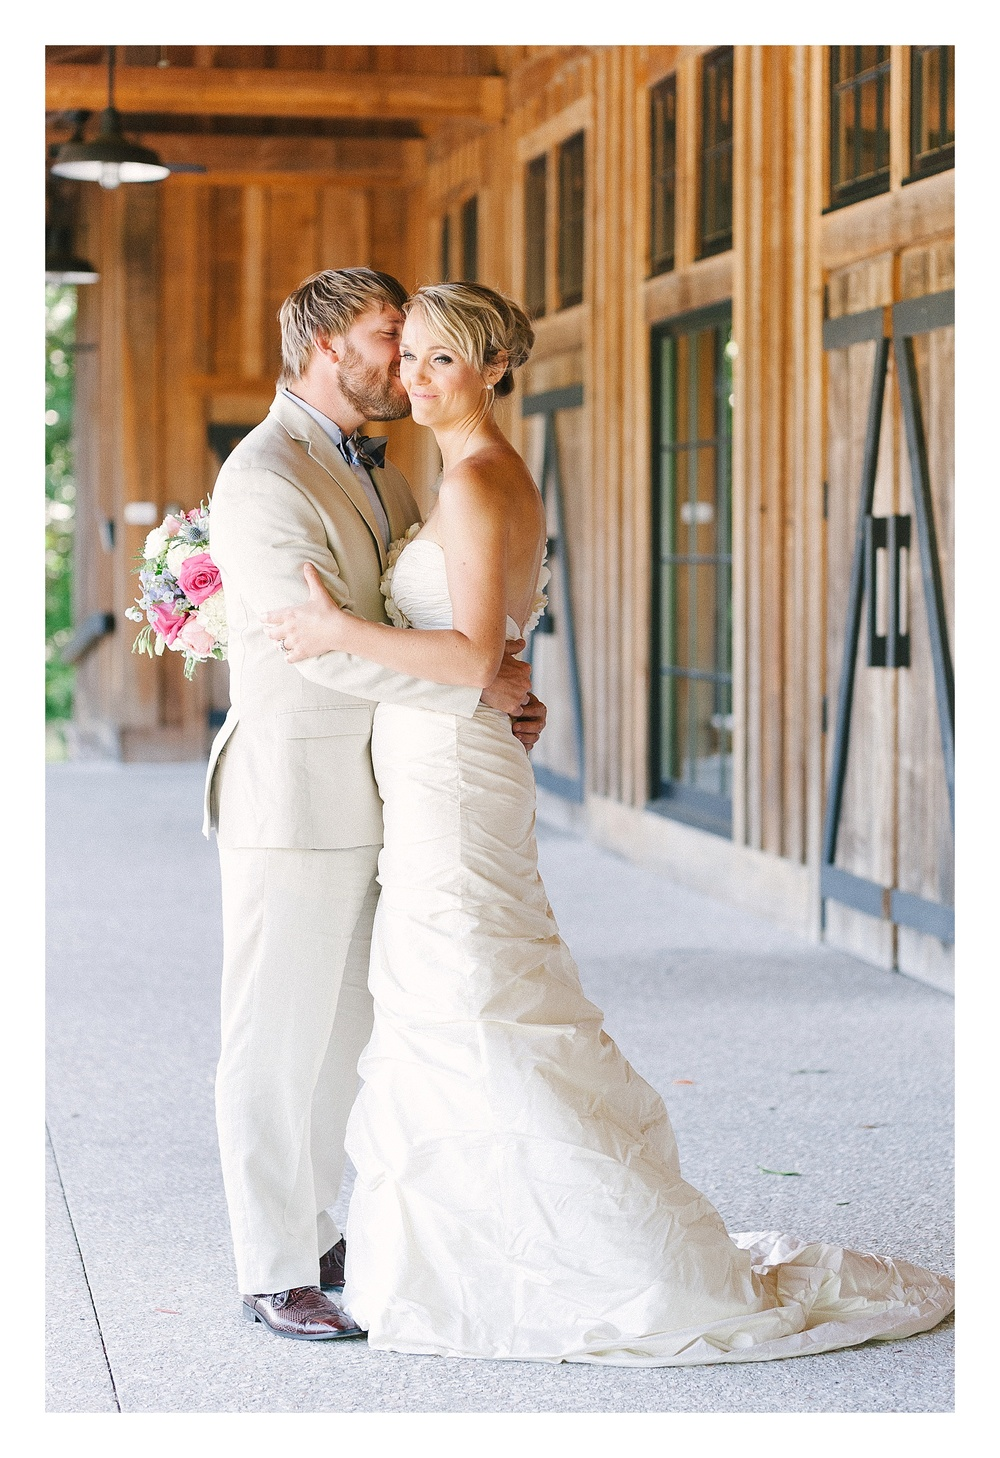 Charlotte wedding photographer captures bride and groom